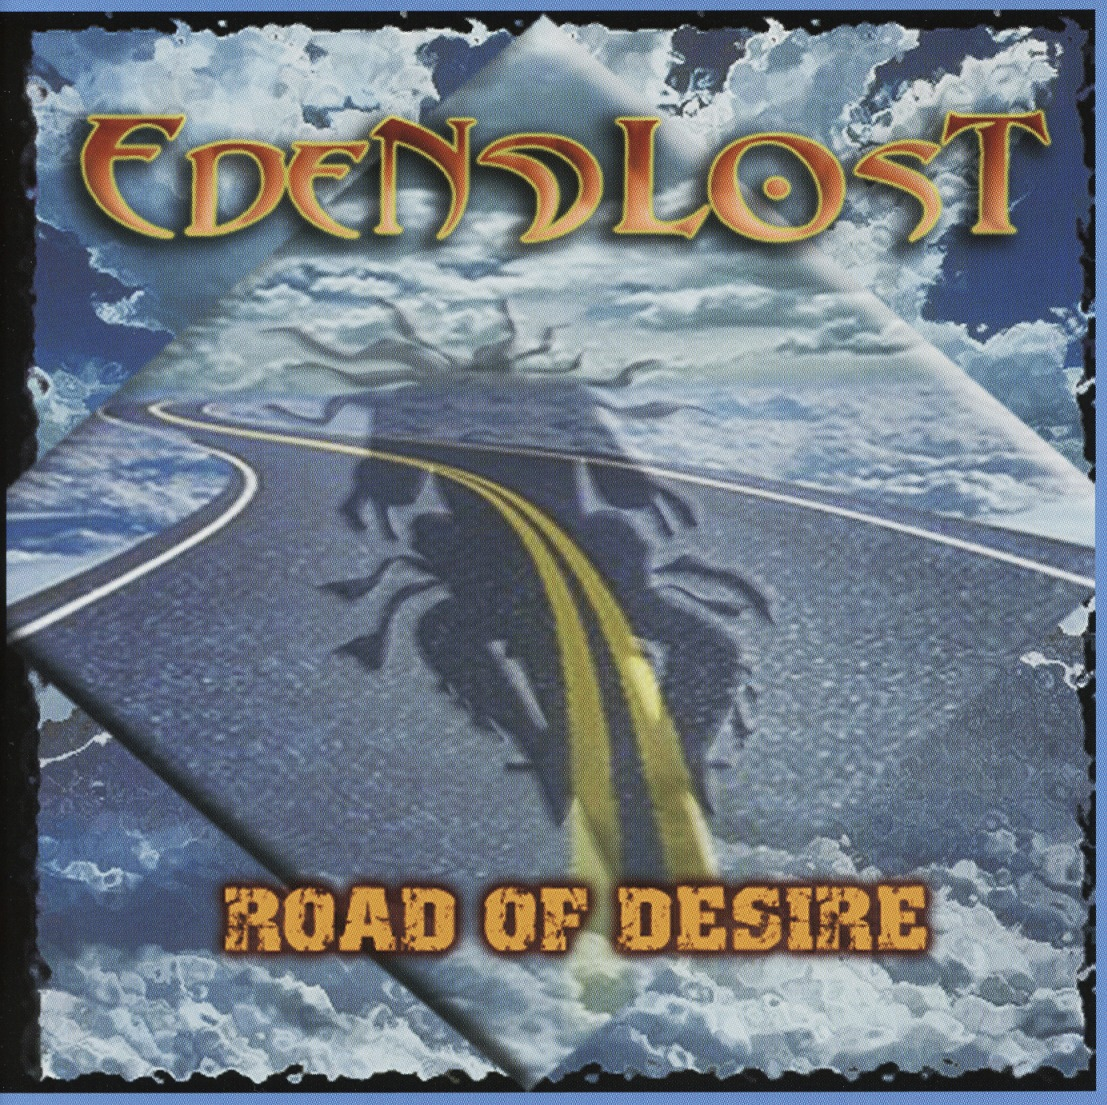 EDEN LOST(Spain) / Road Of Desire